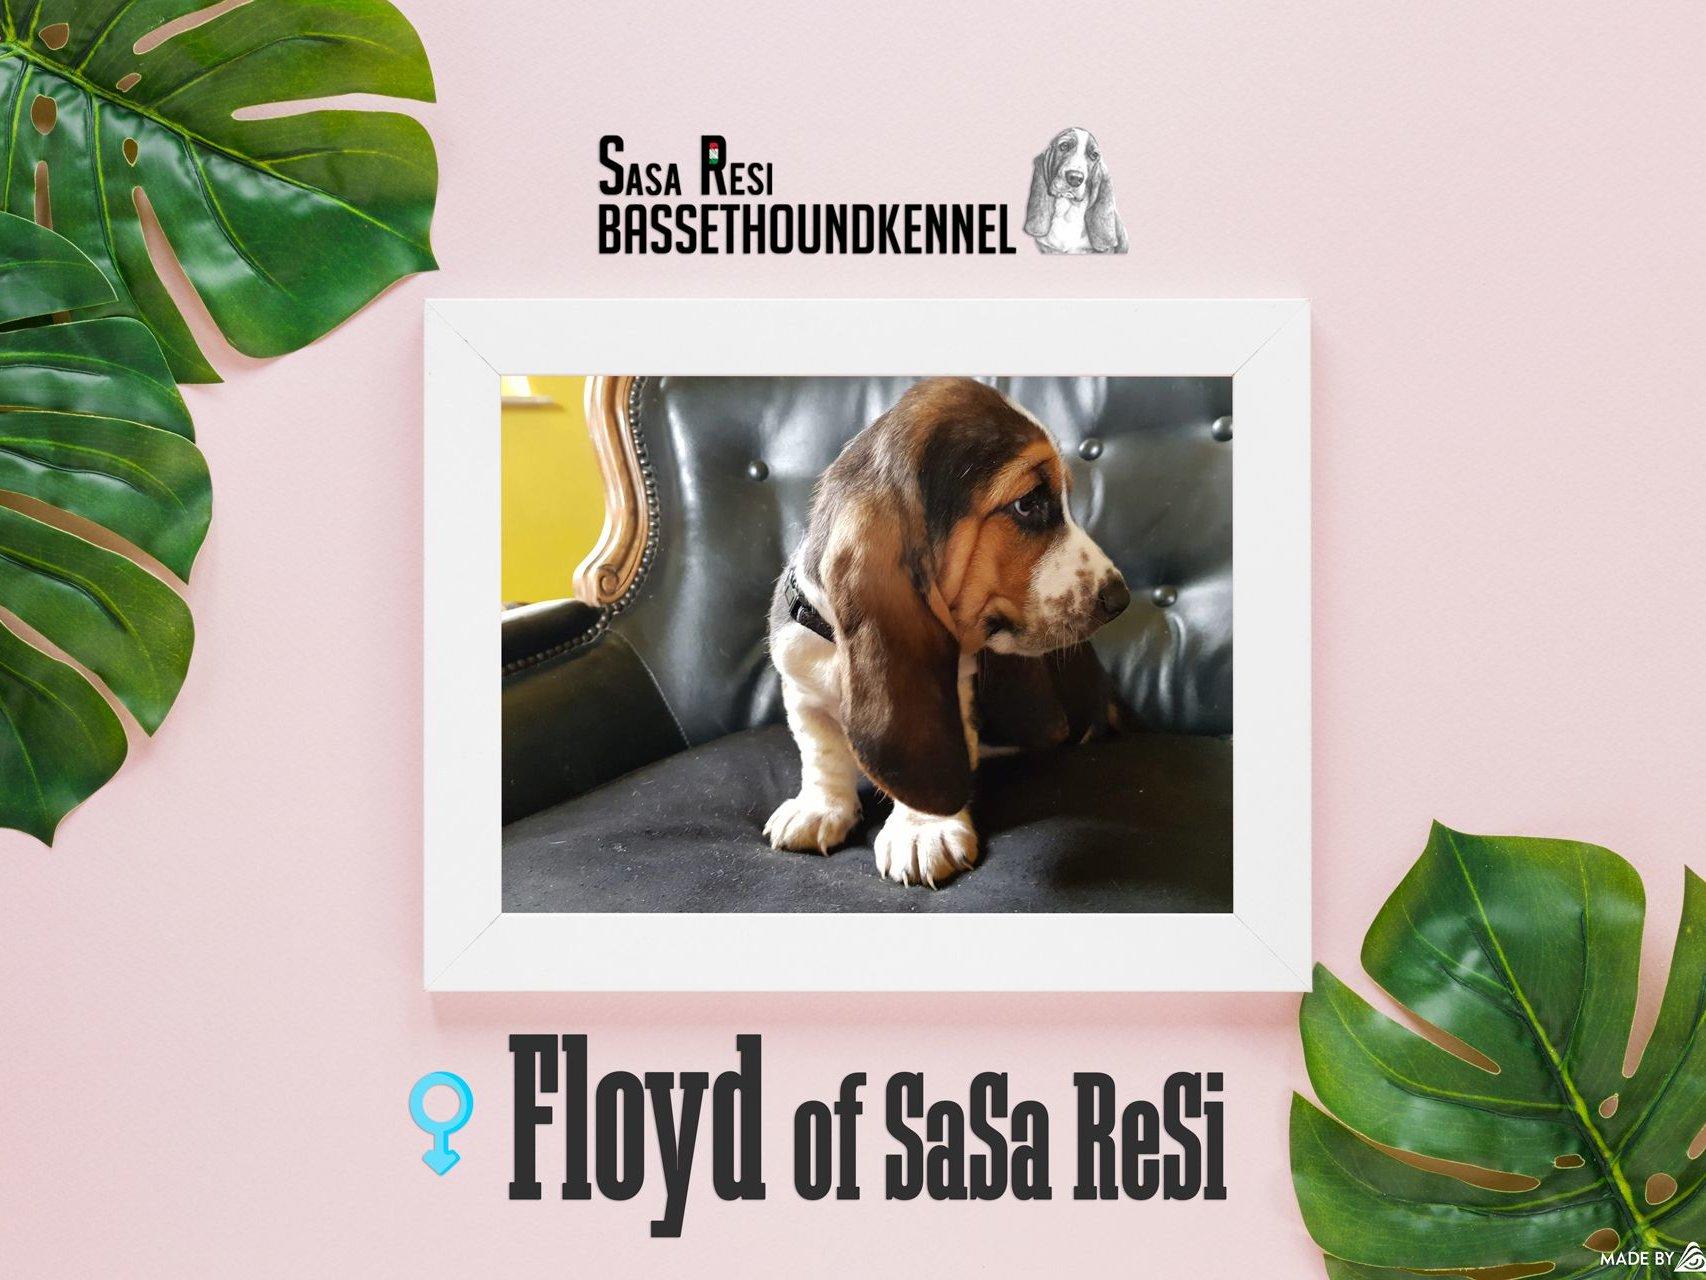 floyd 1 uai SaSa ReSi Bassethoundkennel